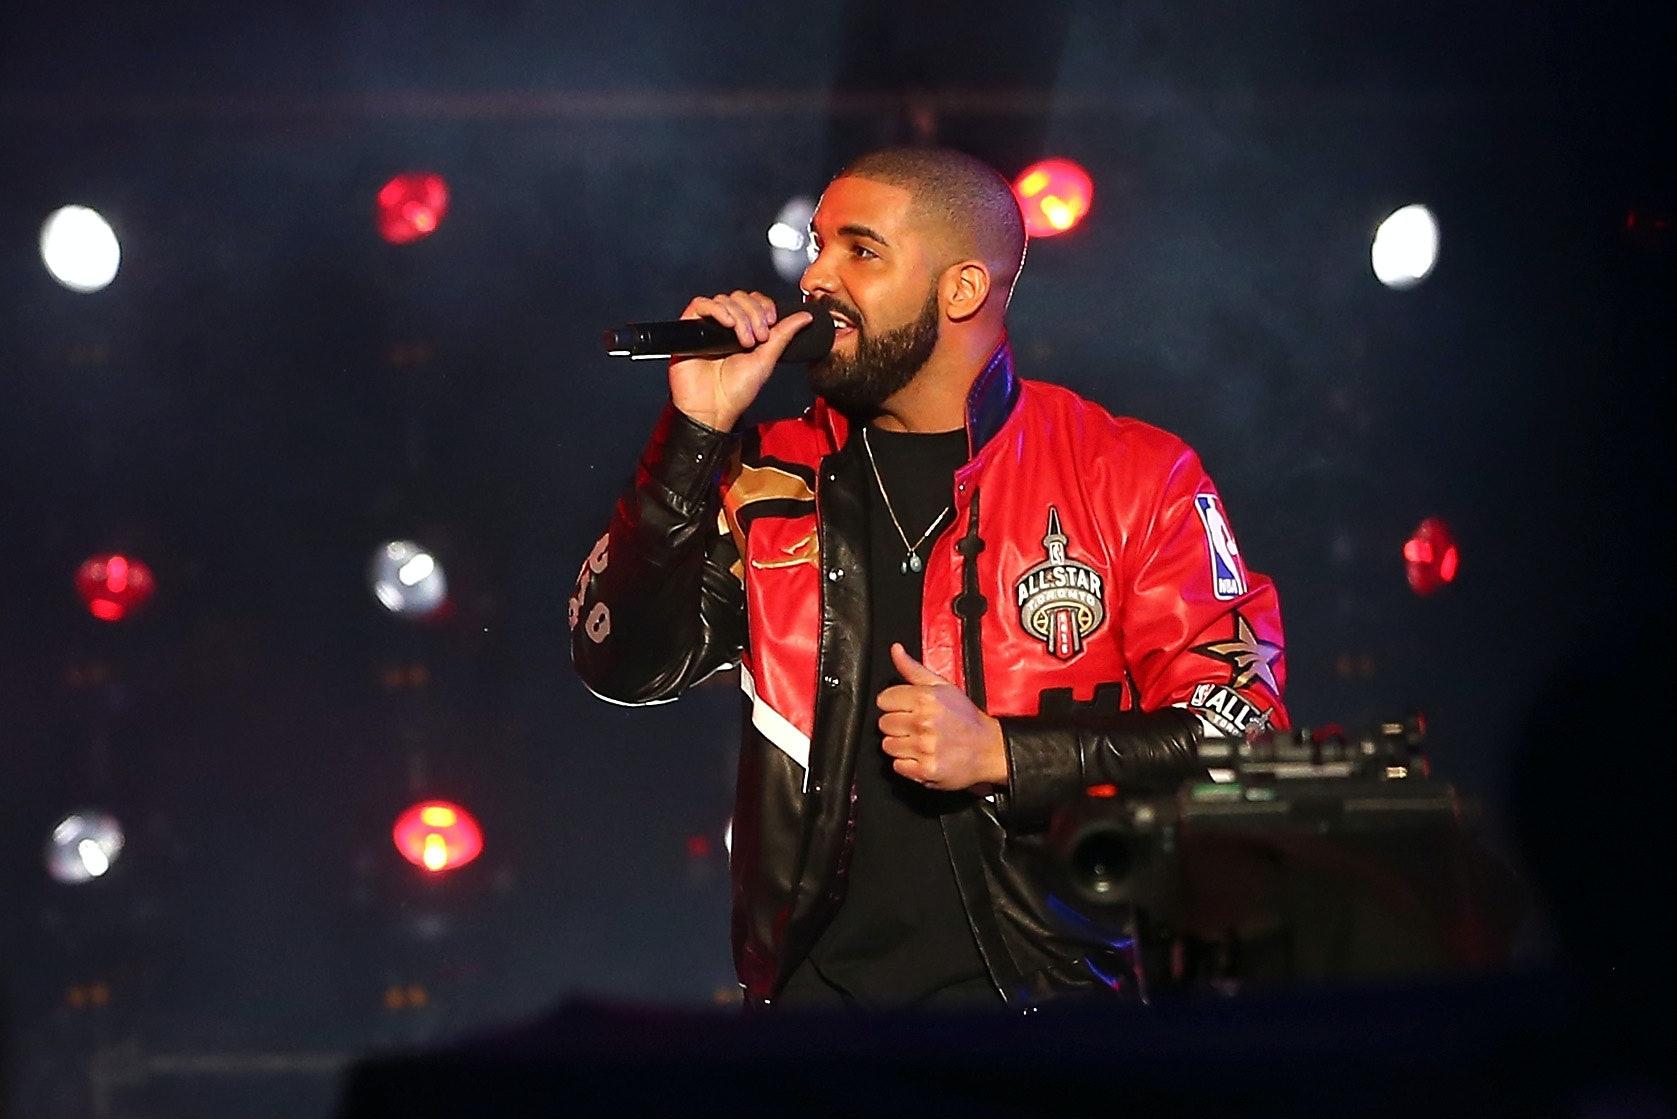 What Do Drake\u0027s \u0027Pop Style\u0027 Lyrics Mean? The Song Is